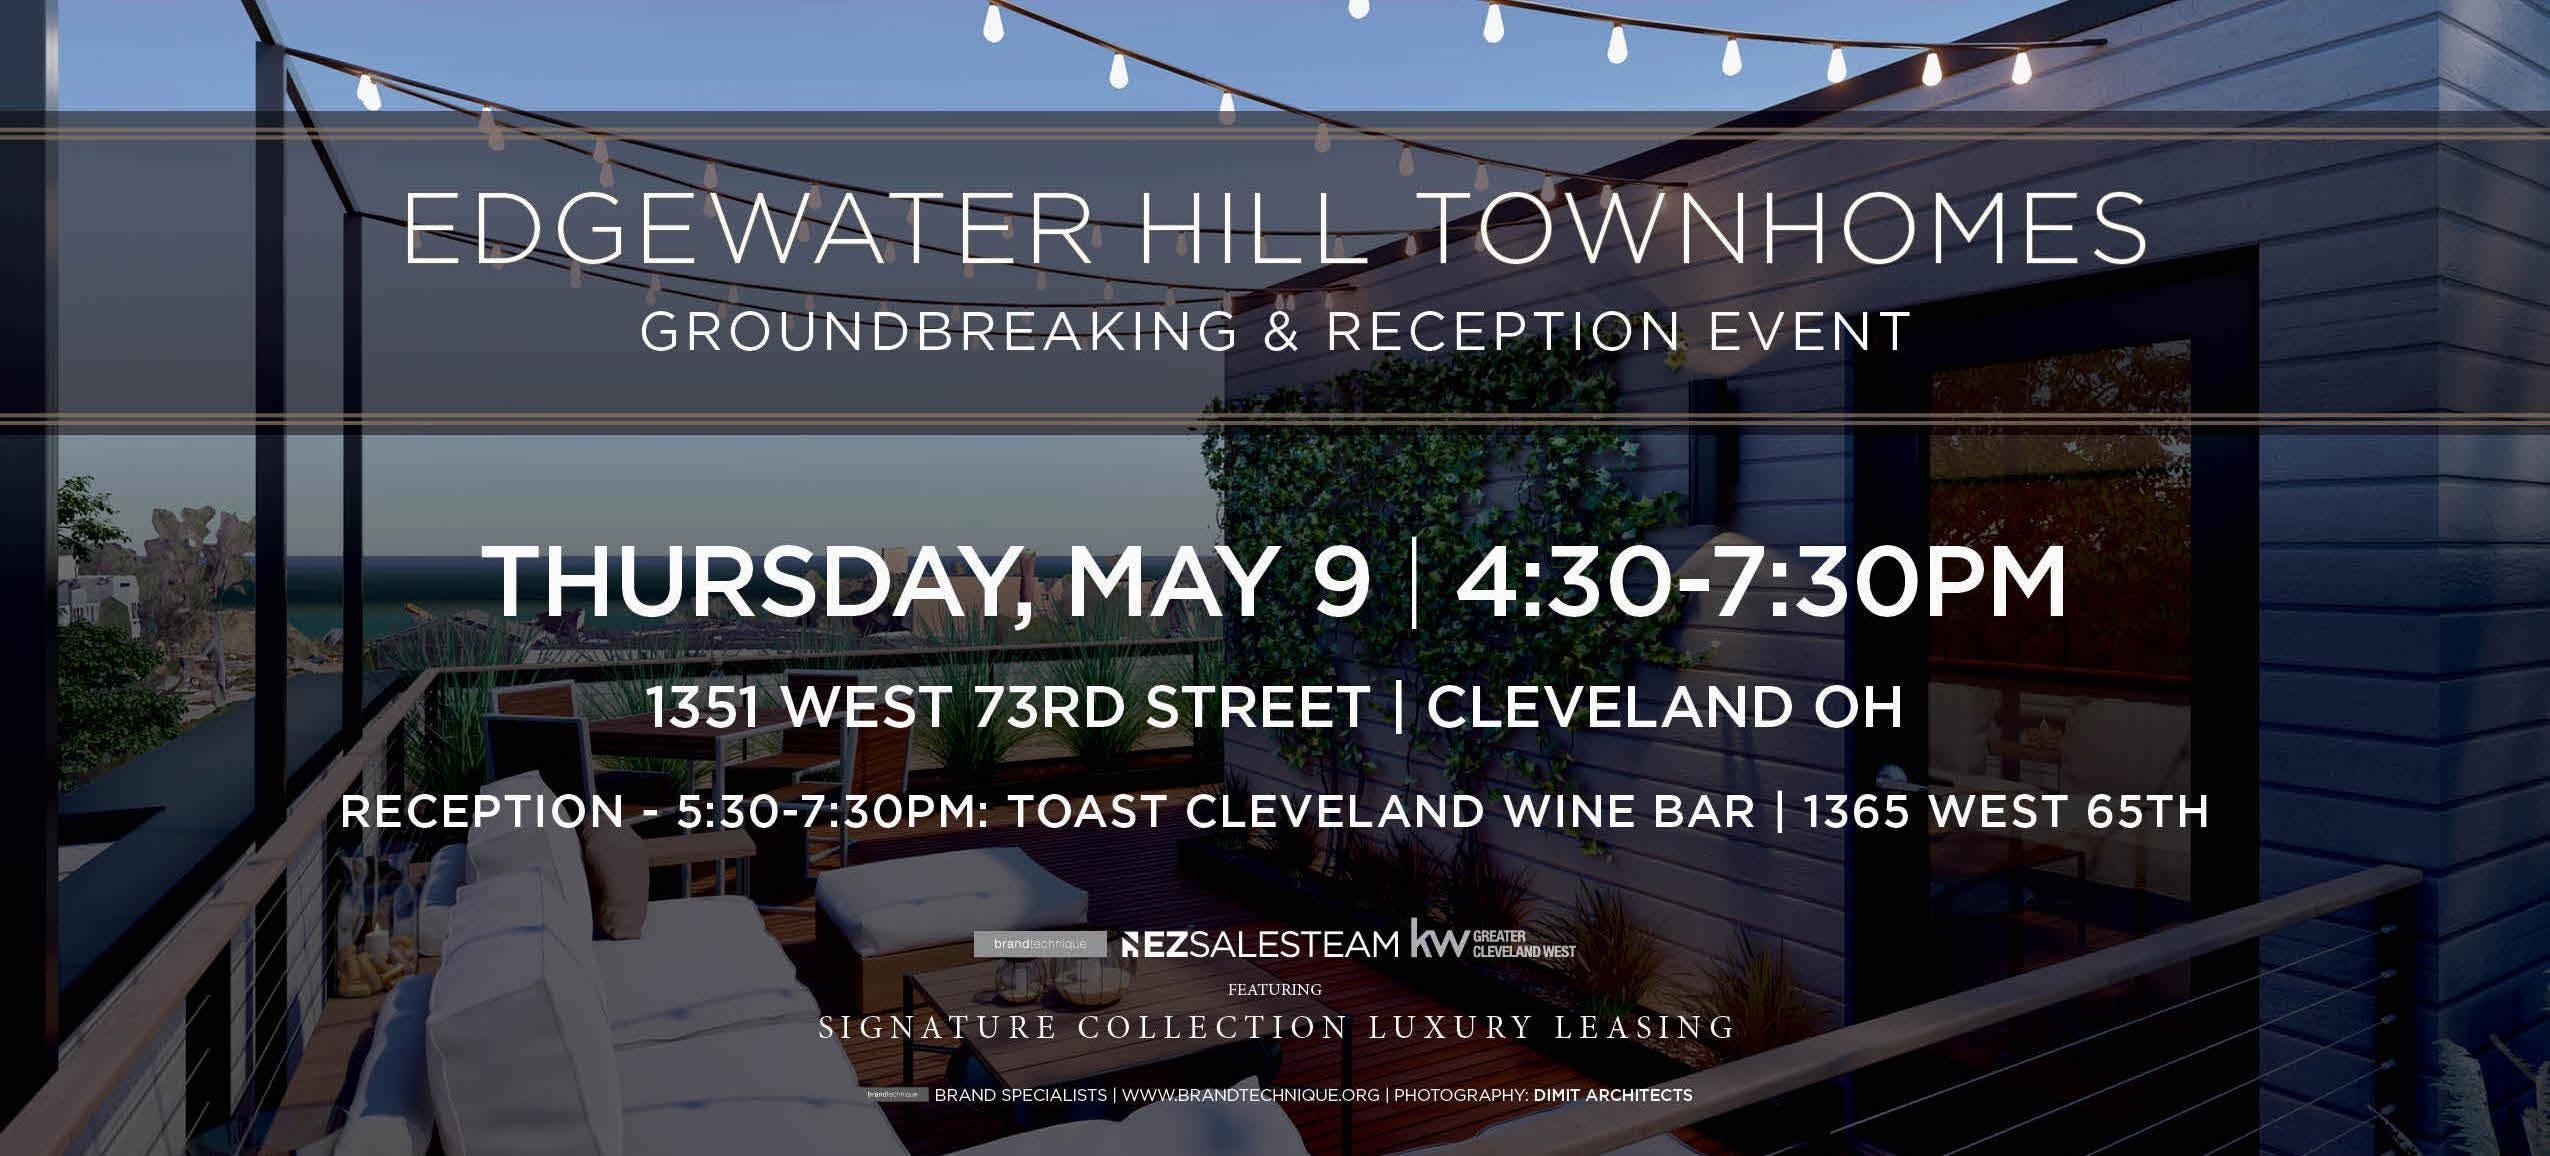 Edgewater Hill Luxury Townhomes - Groundbreaking & Reception